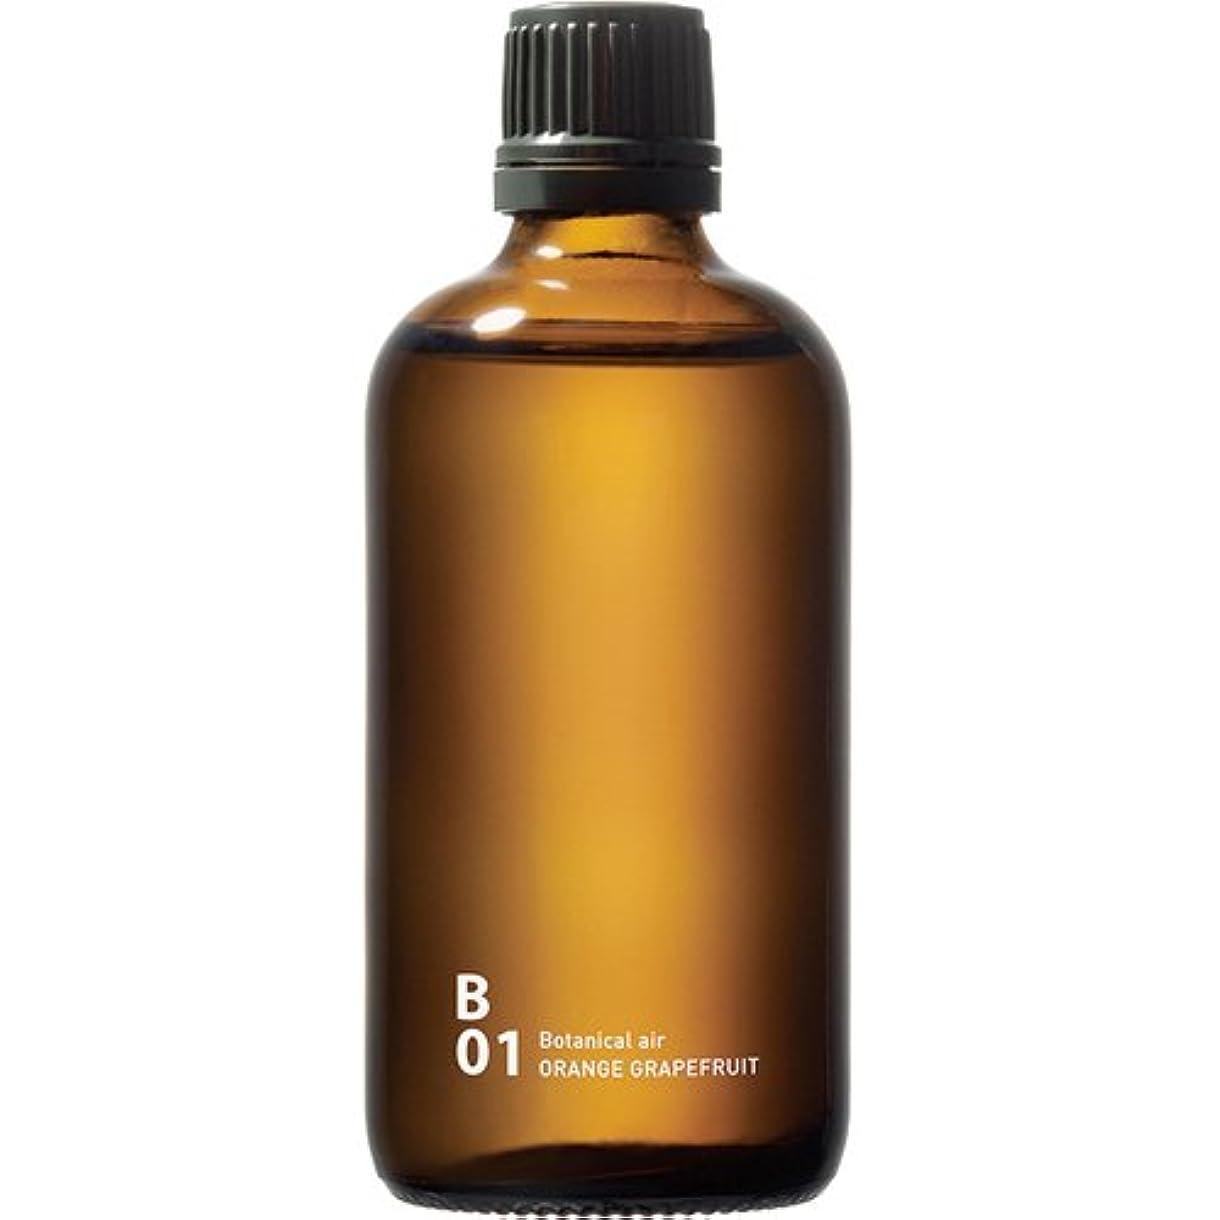 九月遺伝子修理工B01 ORANGE GRAPEFRUIT piezo aroma oil 100ml